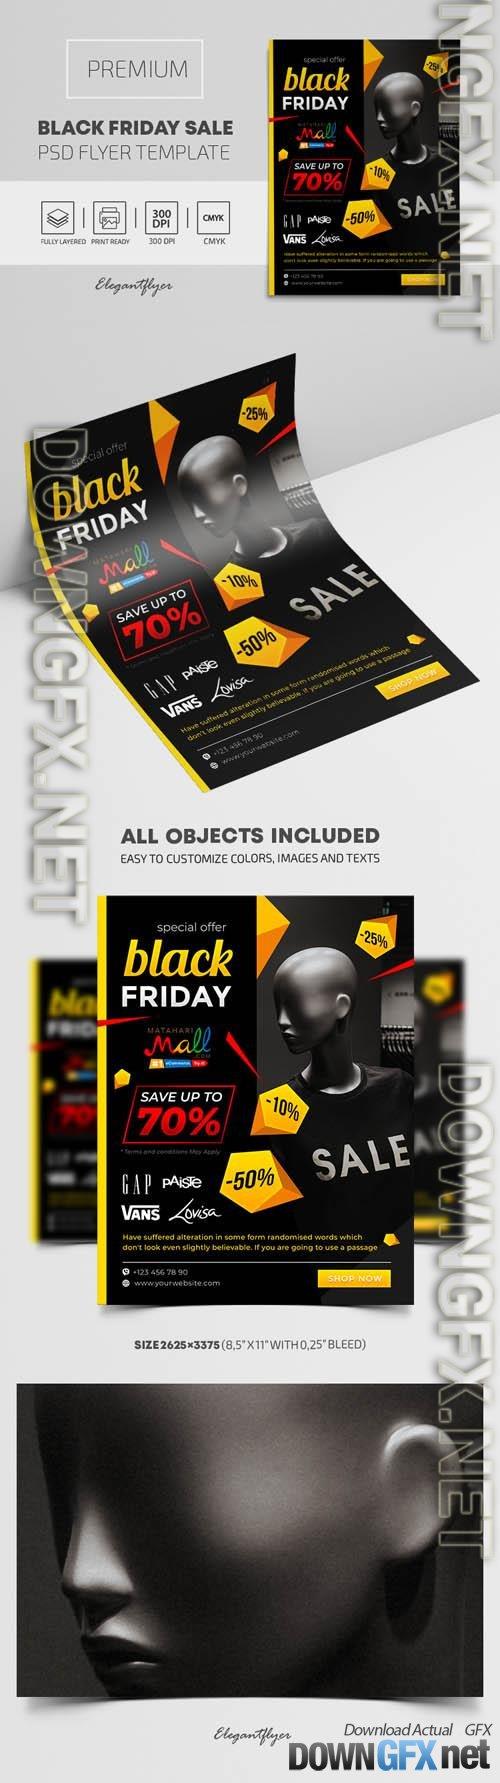 Black Friday Sales  Premium PSD Flyer Template